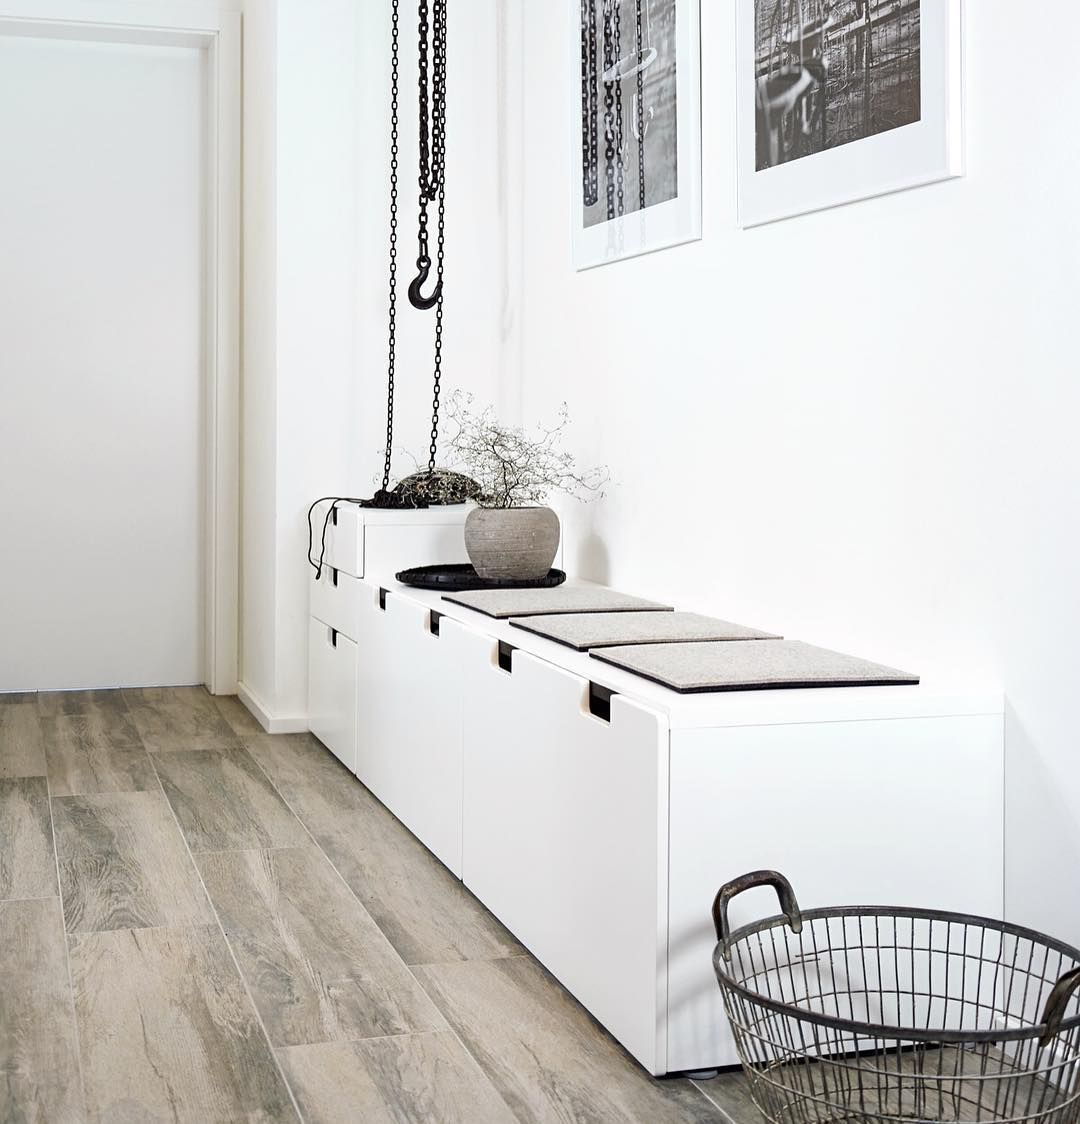 ikea 'stuva' storage units ig: mxlivinghome | home decor | pinterest